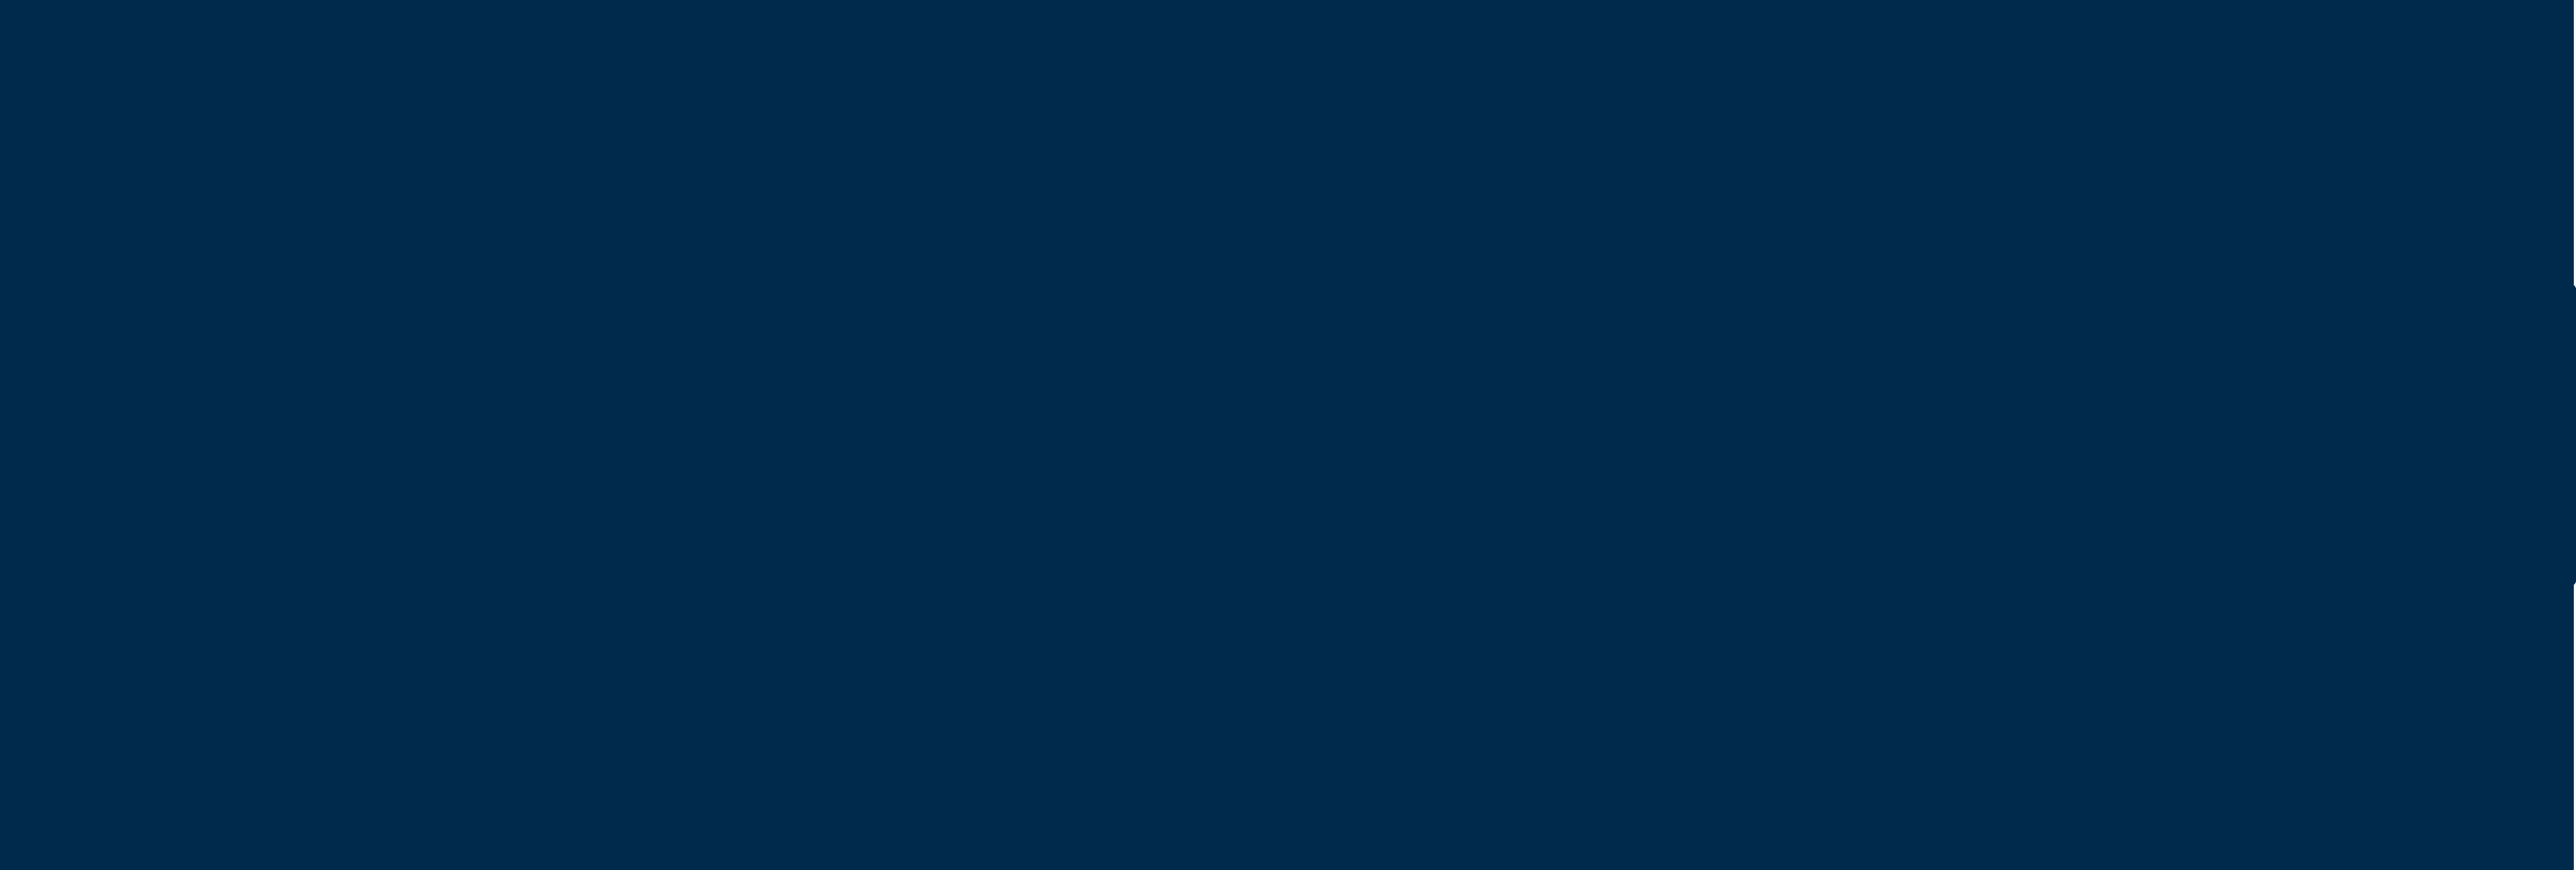 Fintech_Logo_Horizontal_Blue